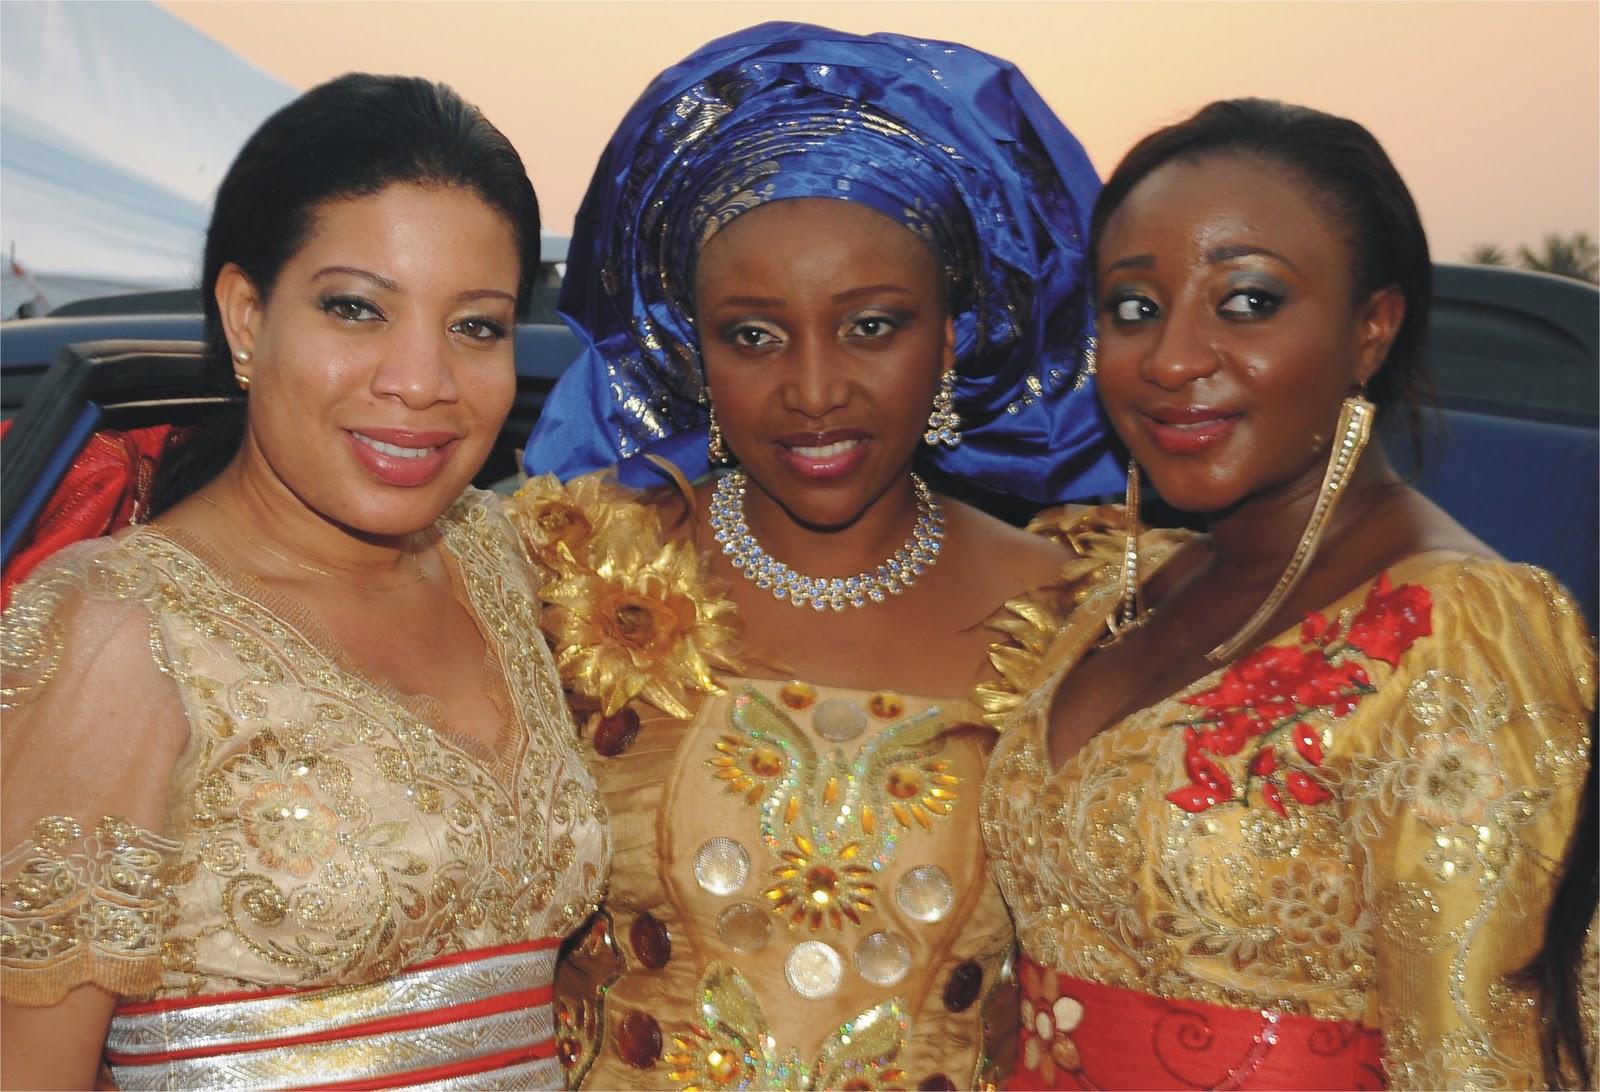 Ini Ikpe Flanked By Edo And Monalisa Chinda